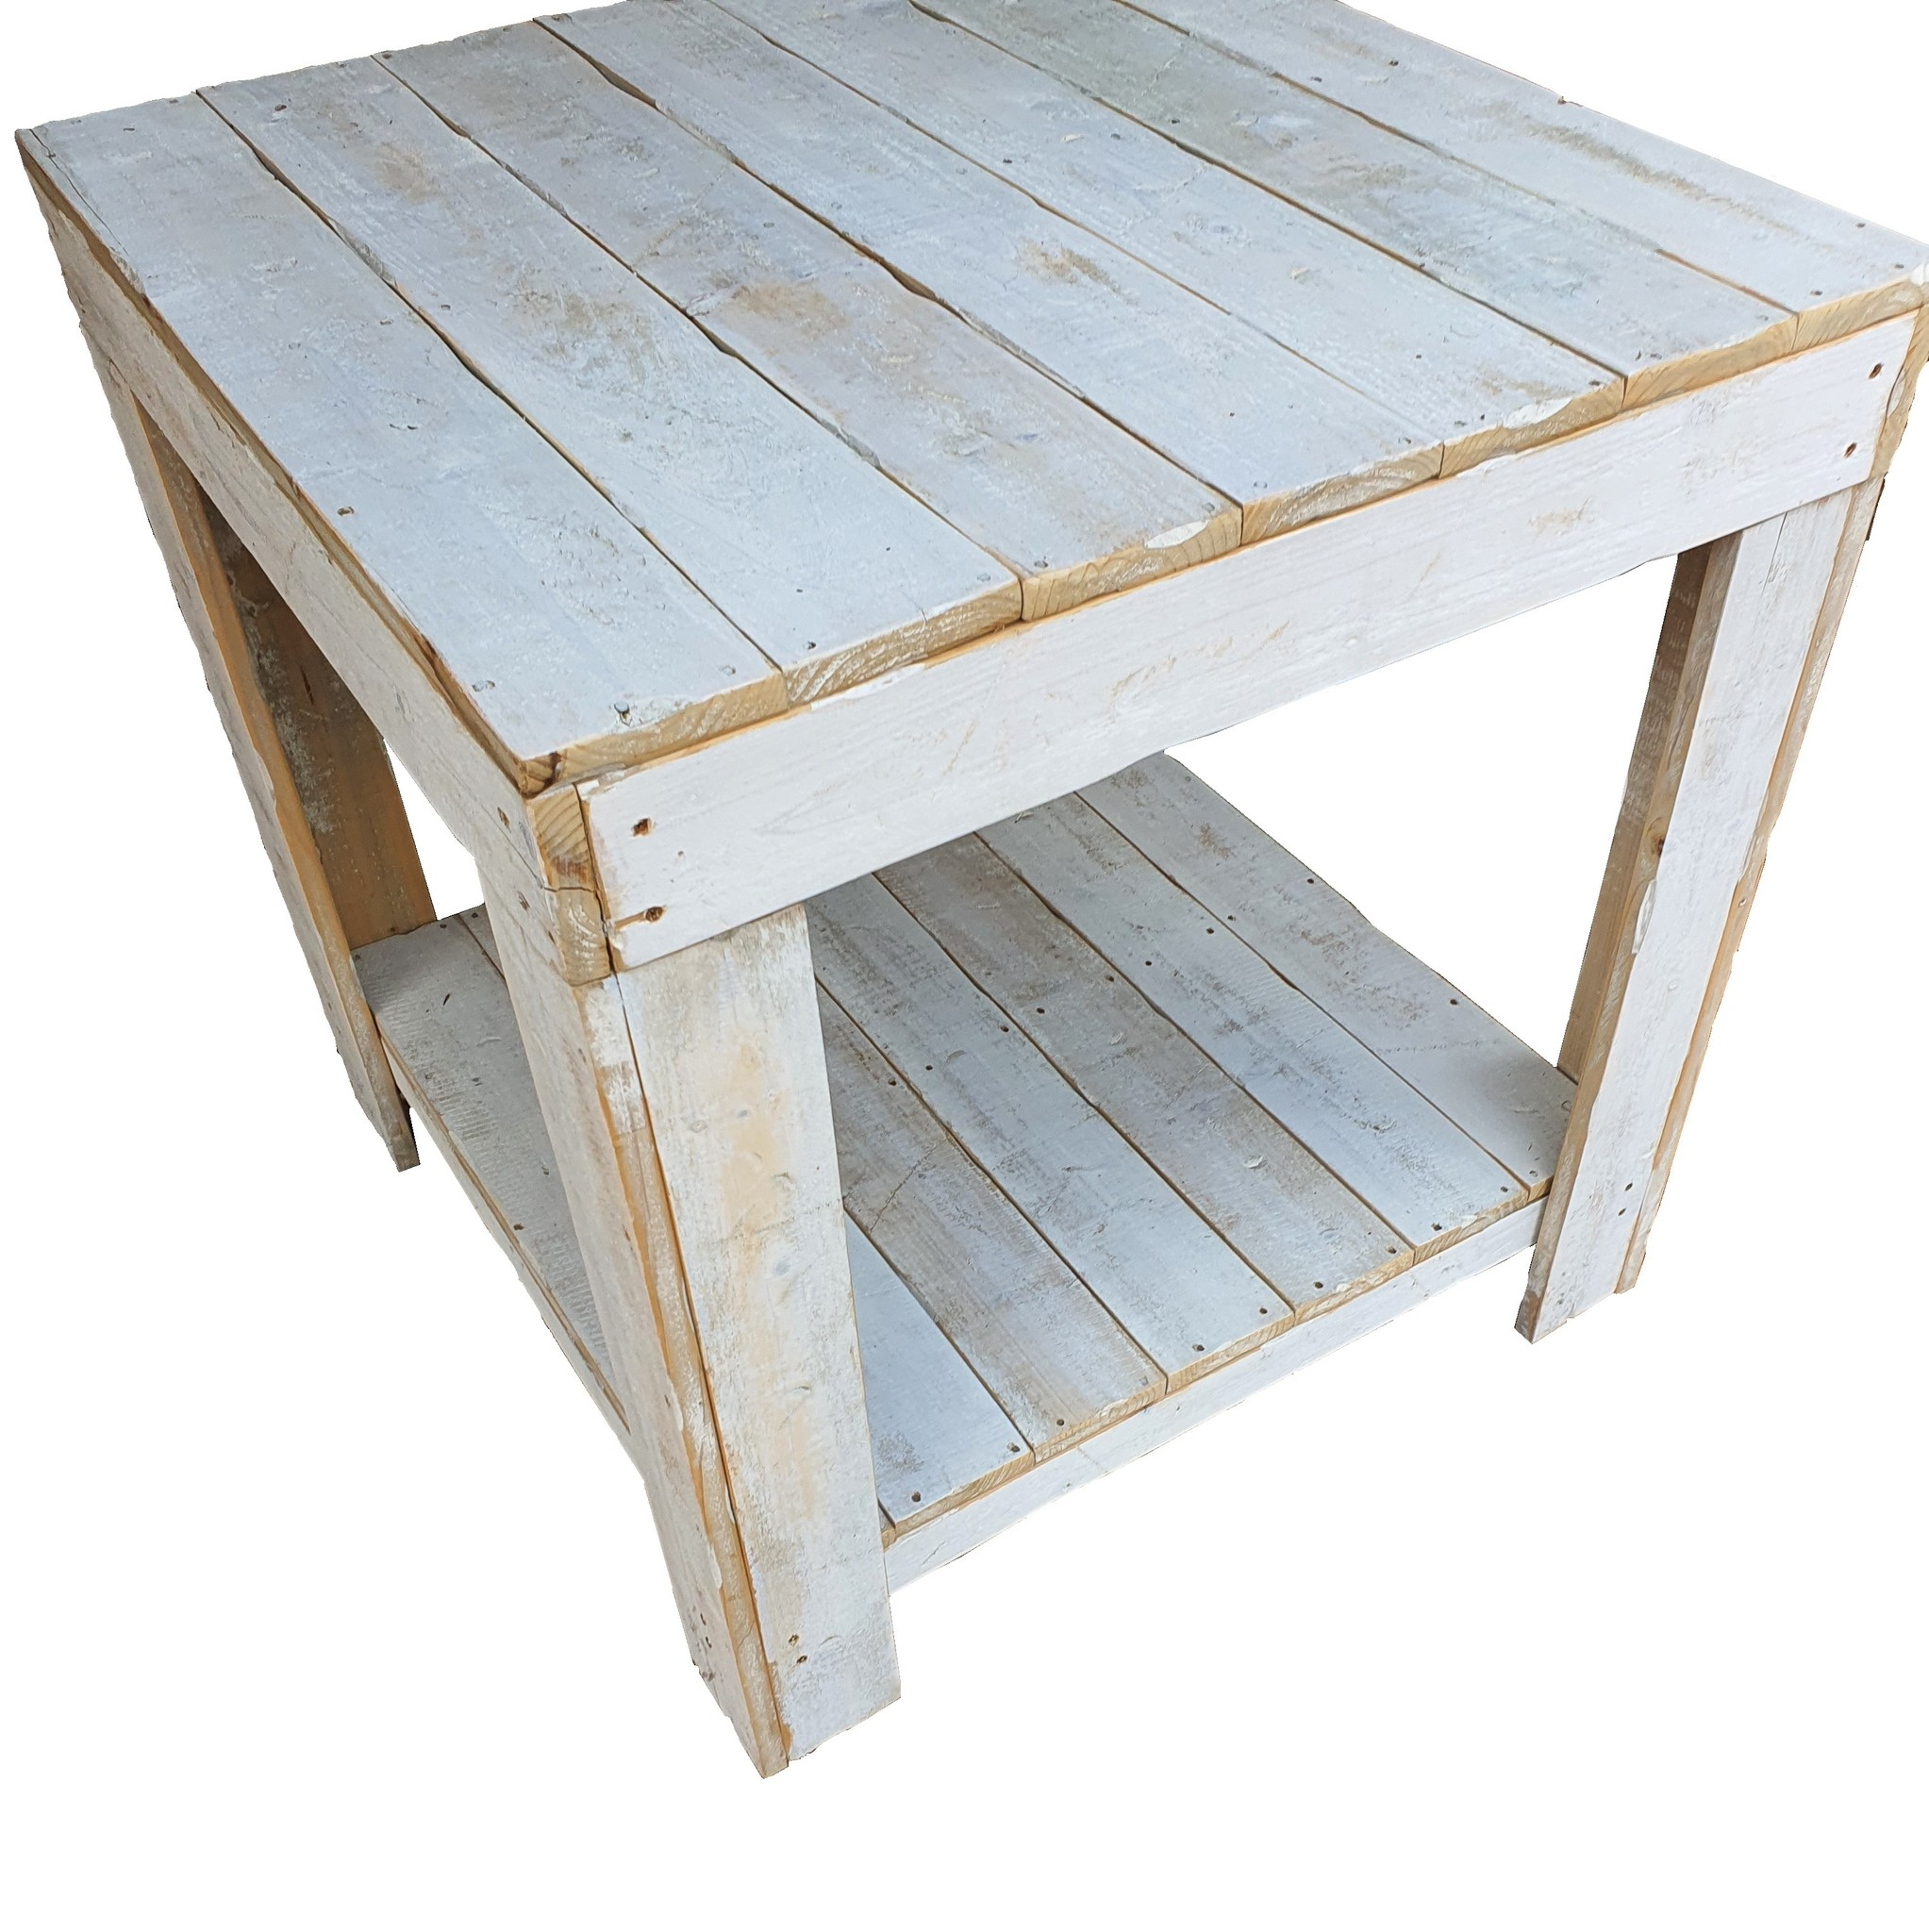 shop int ibiza white table double 78-2